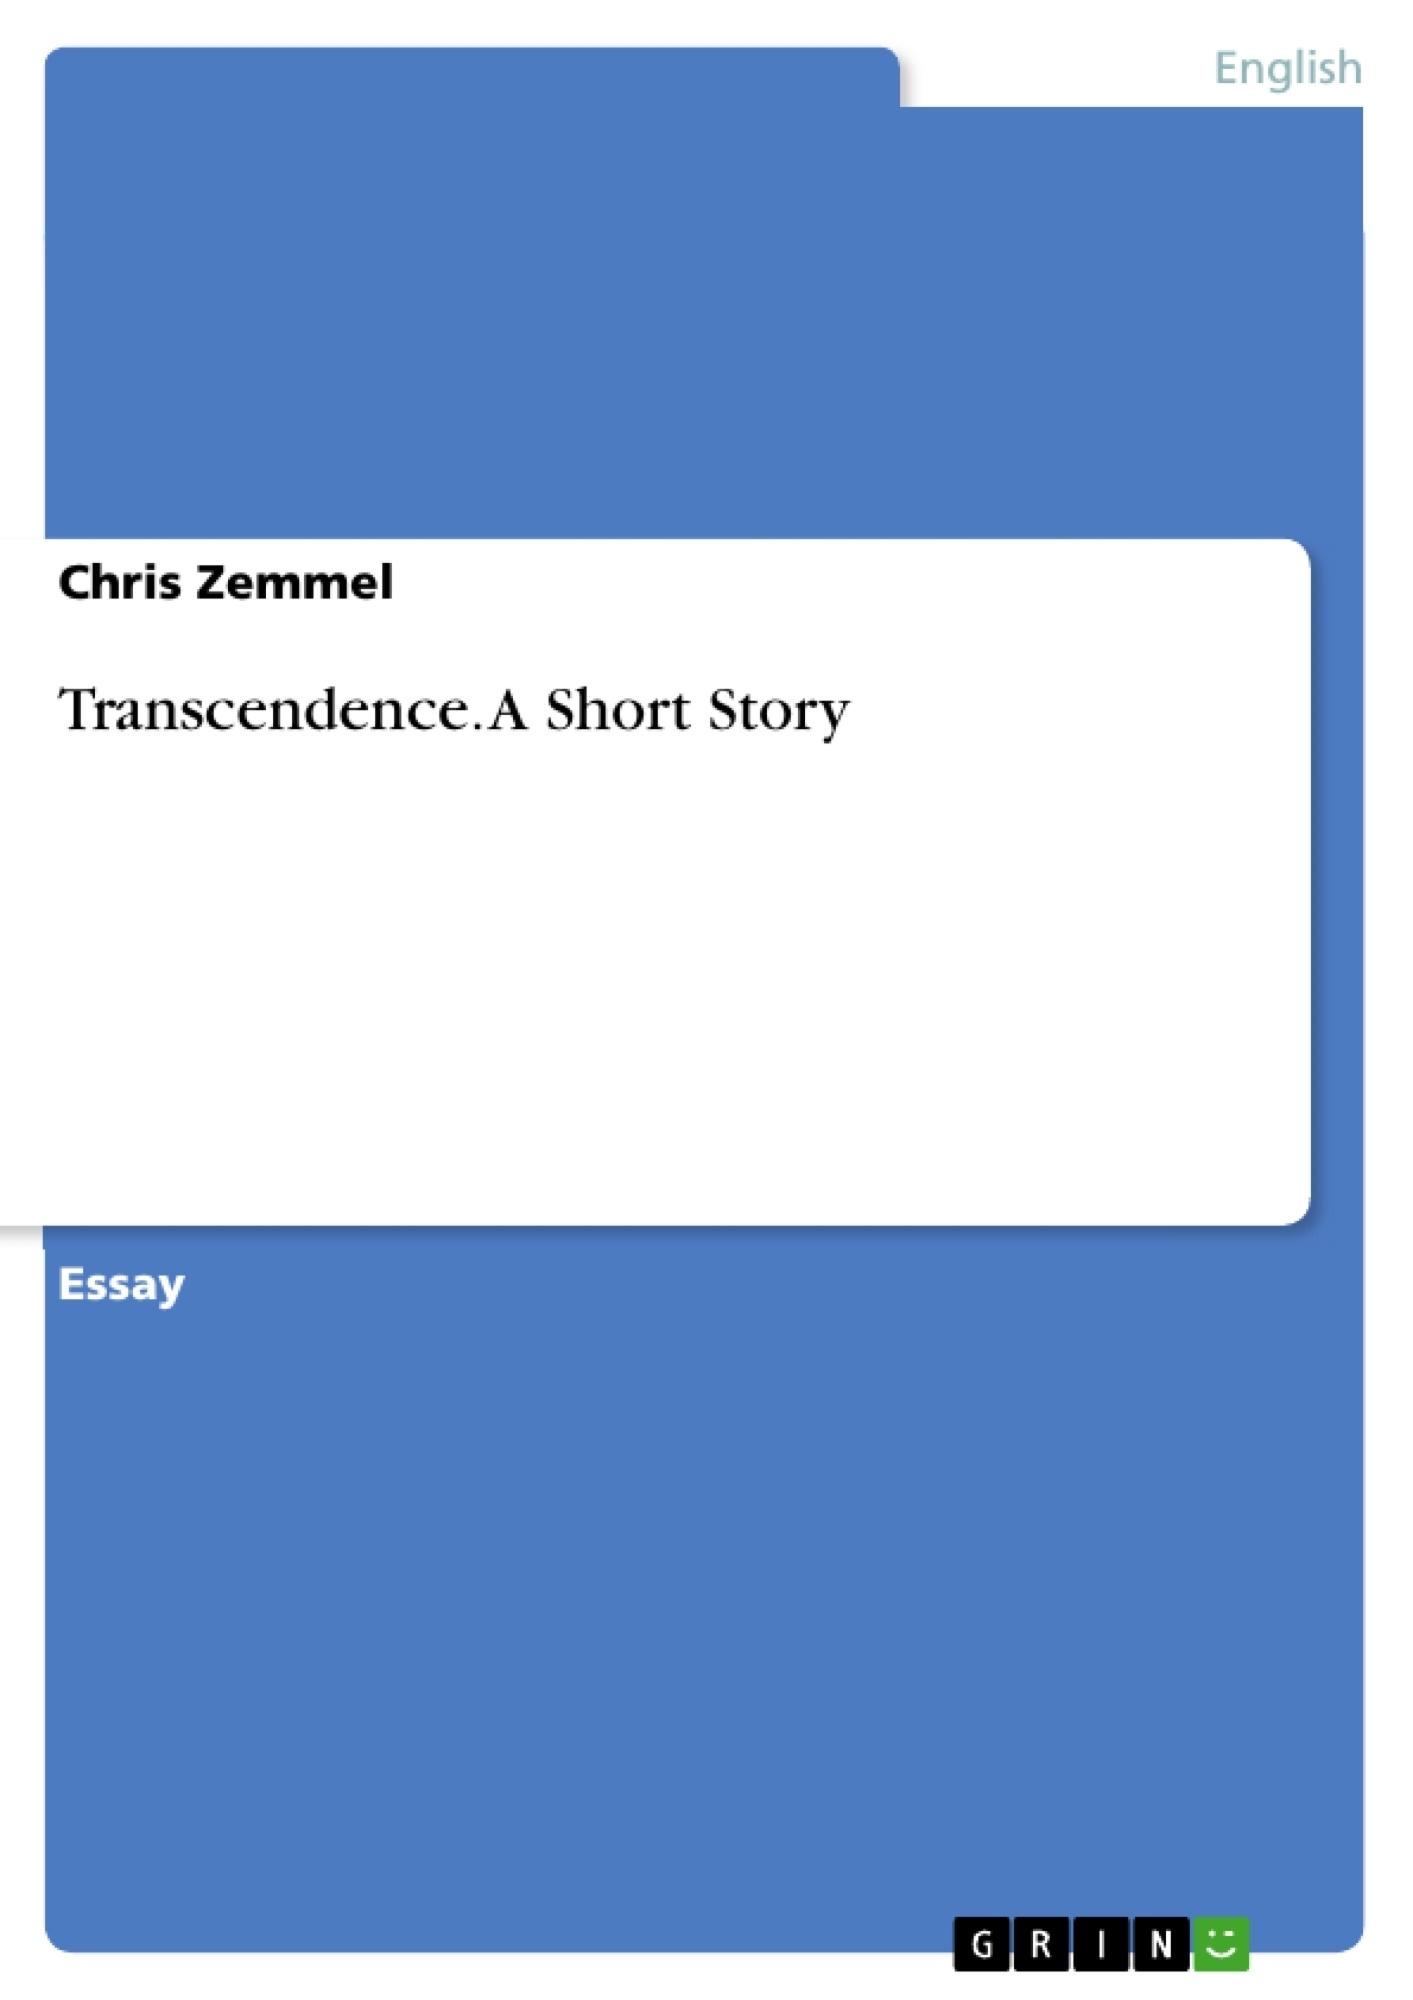 Title: Transcendence. A Short Story